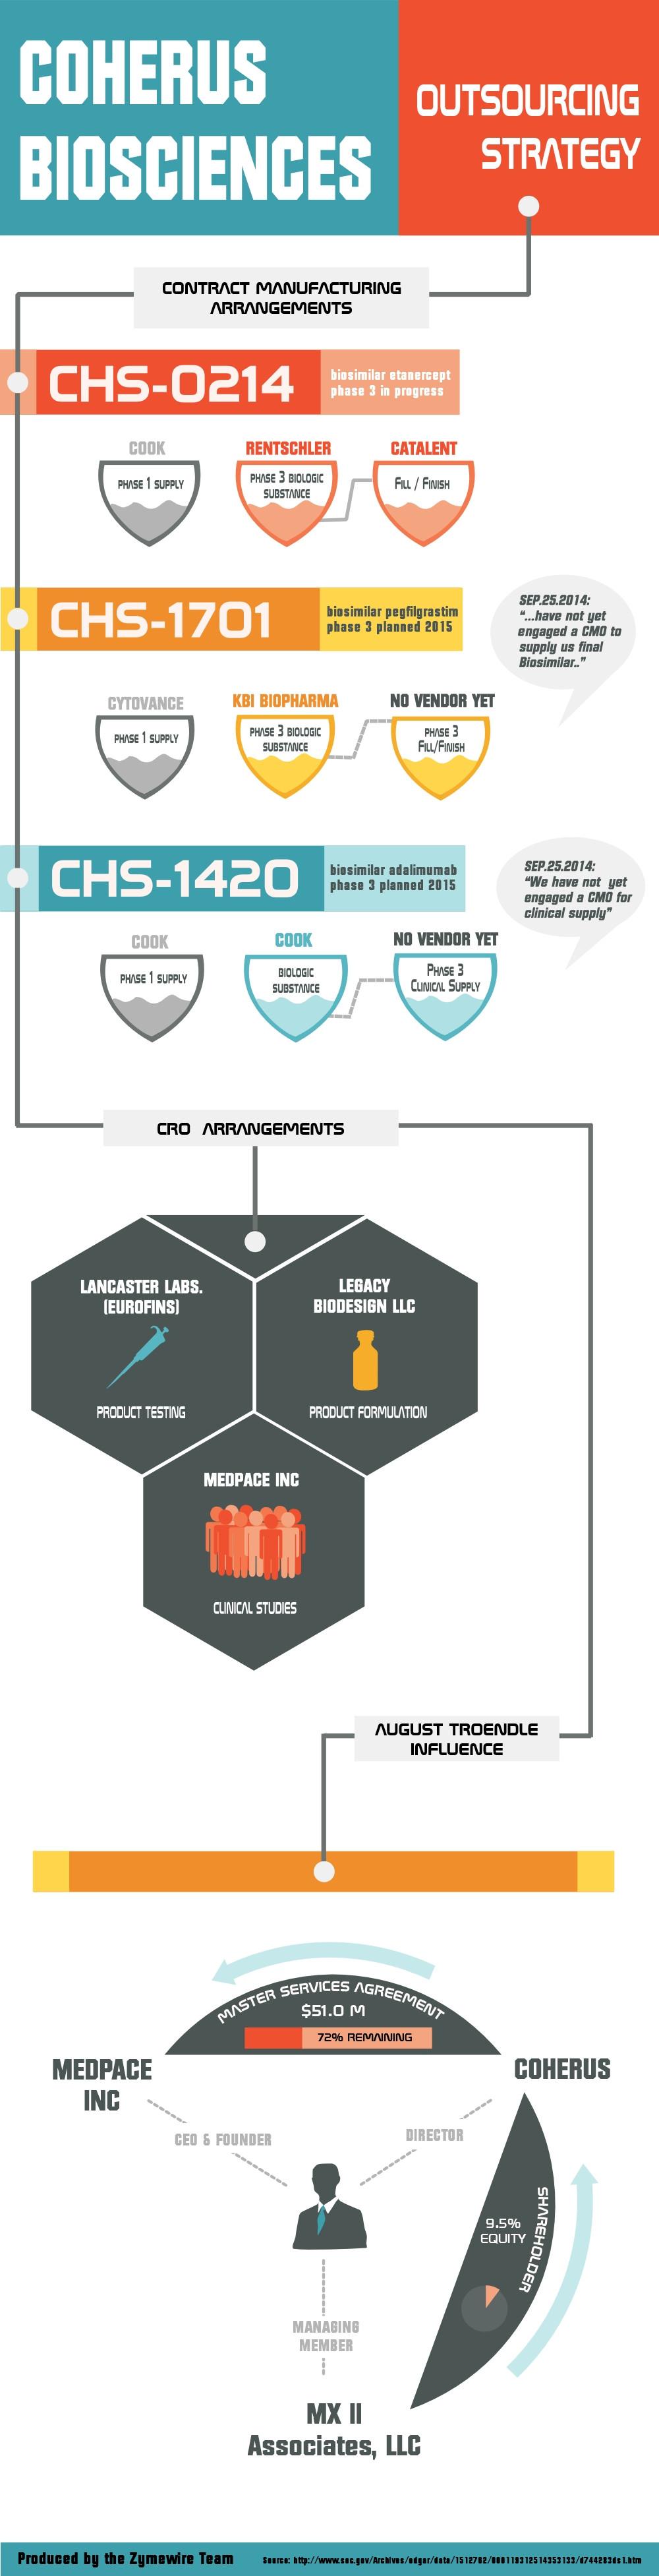 Diagram of Coherus BiosSciences outsourcing CRO CMO vendor strategy